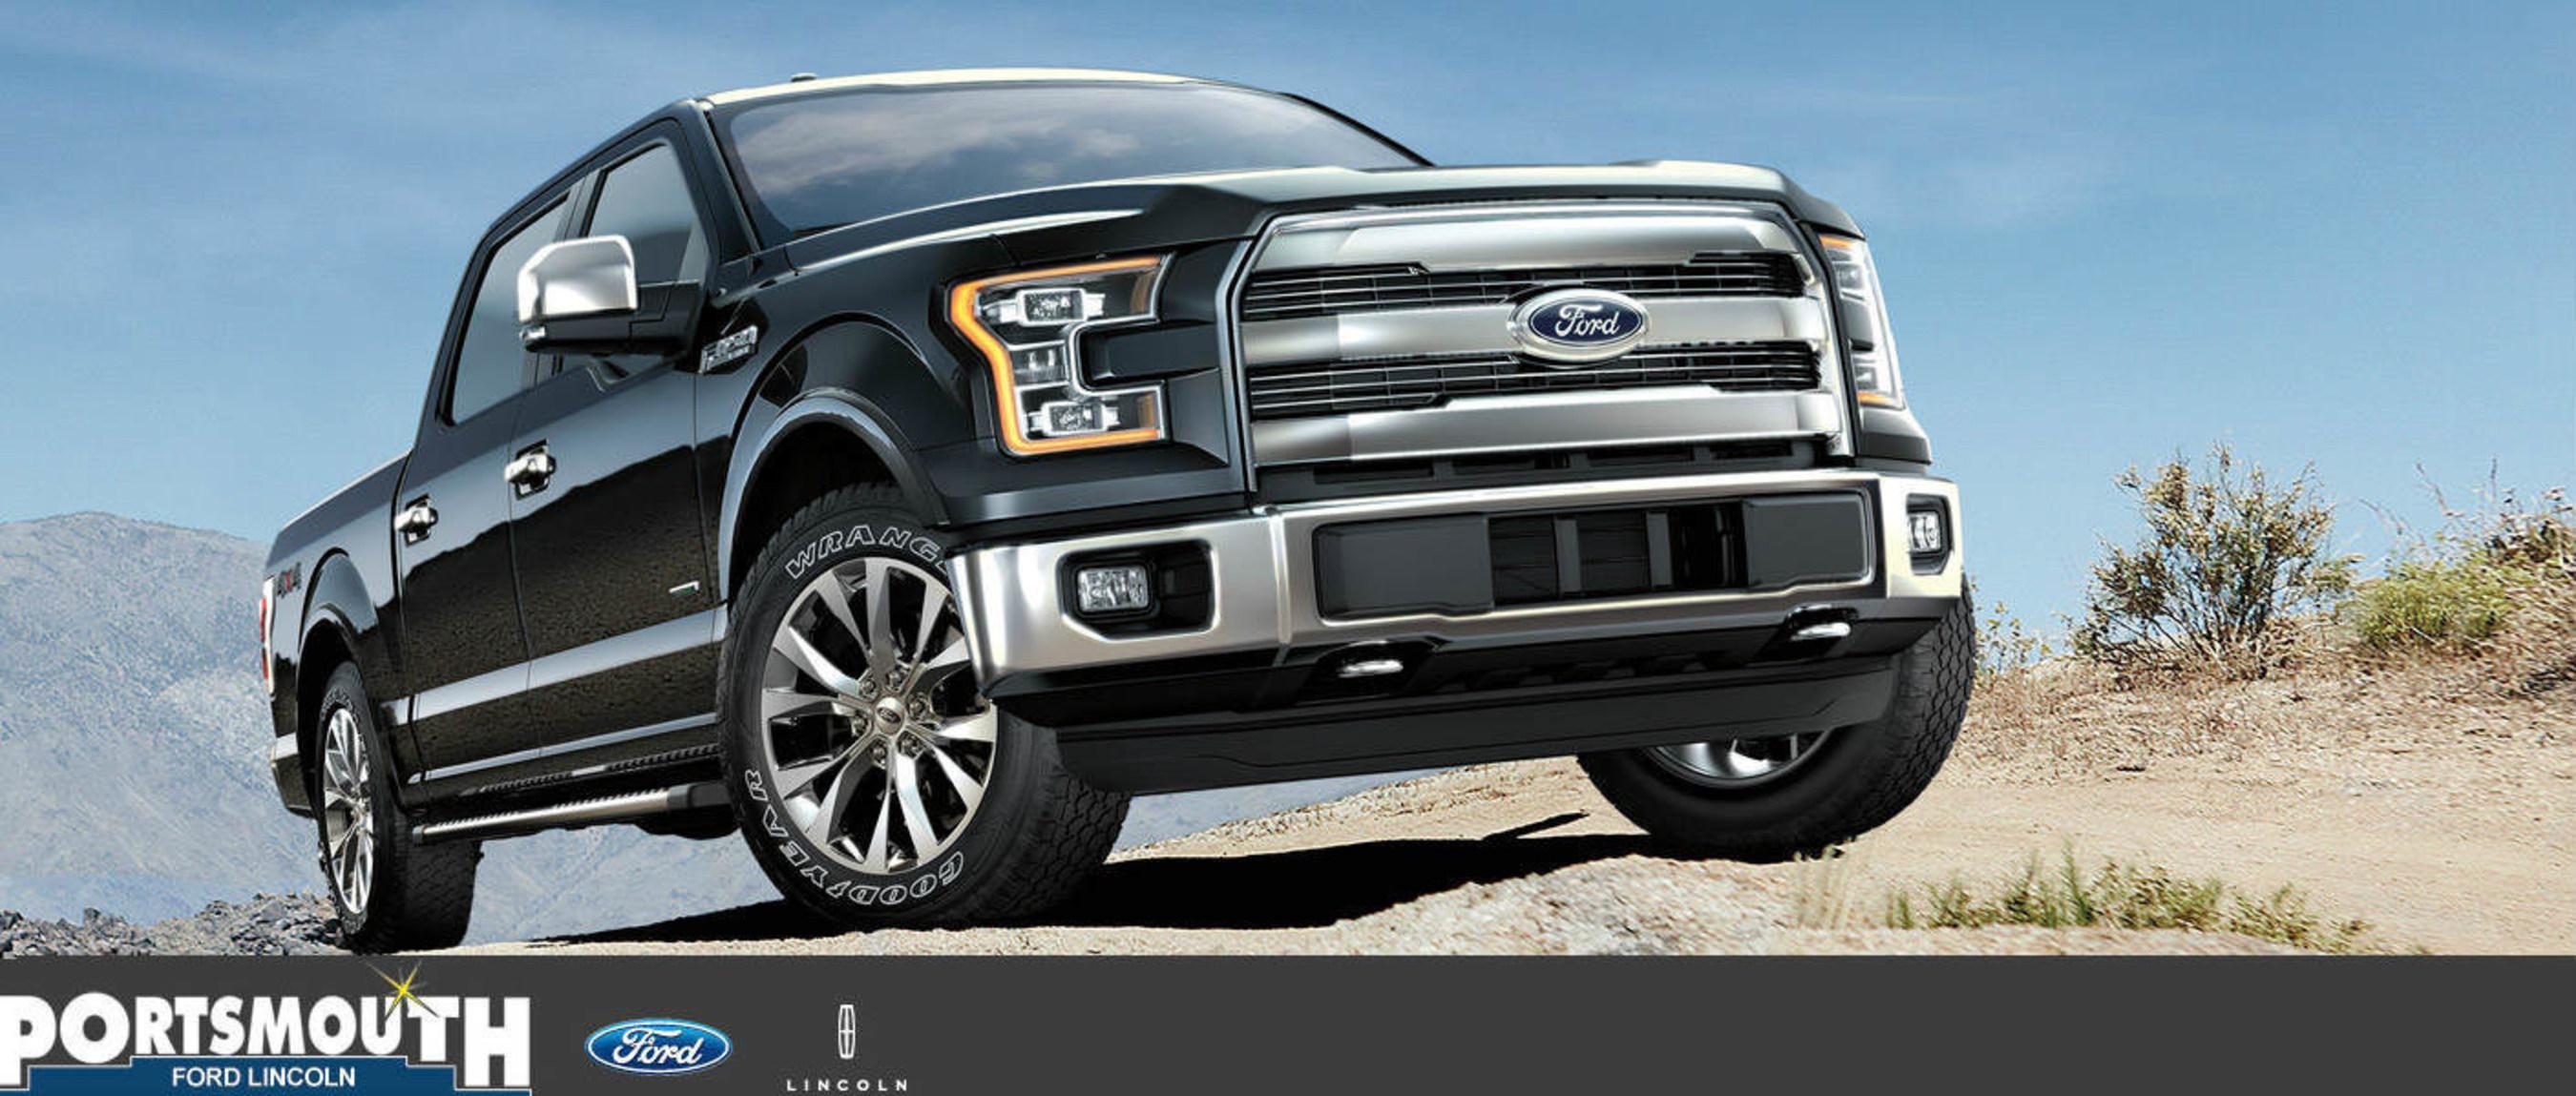 Portsmouth dealership offers Ford program cars